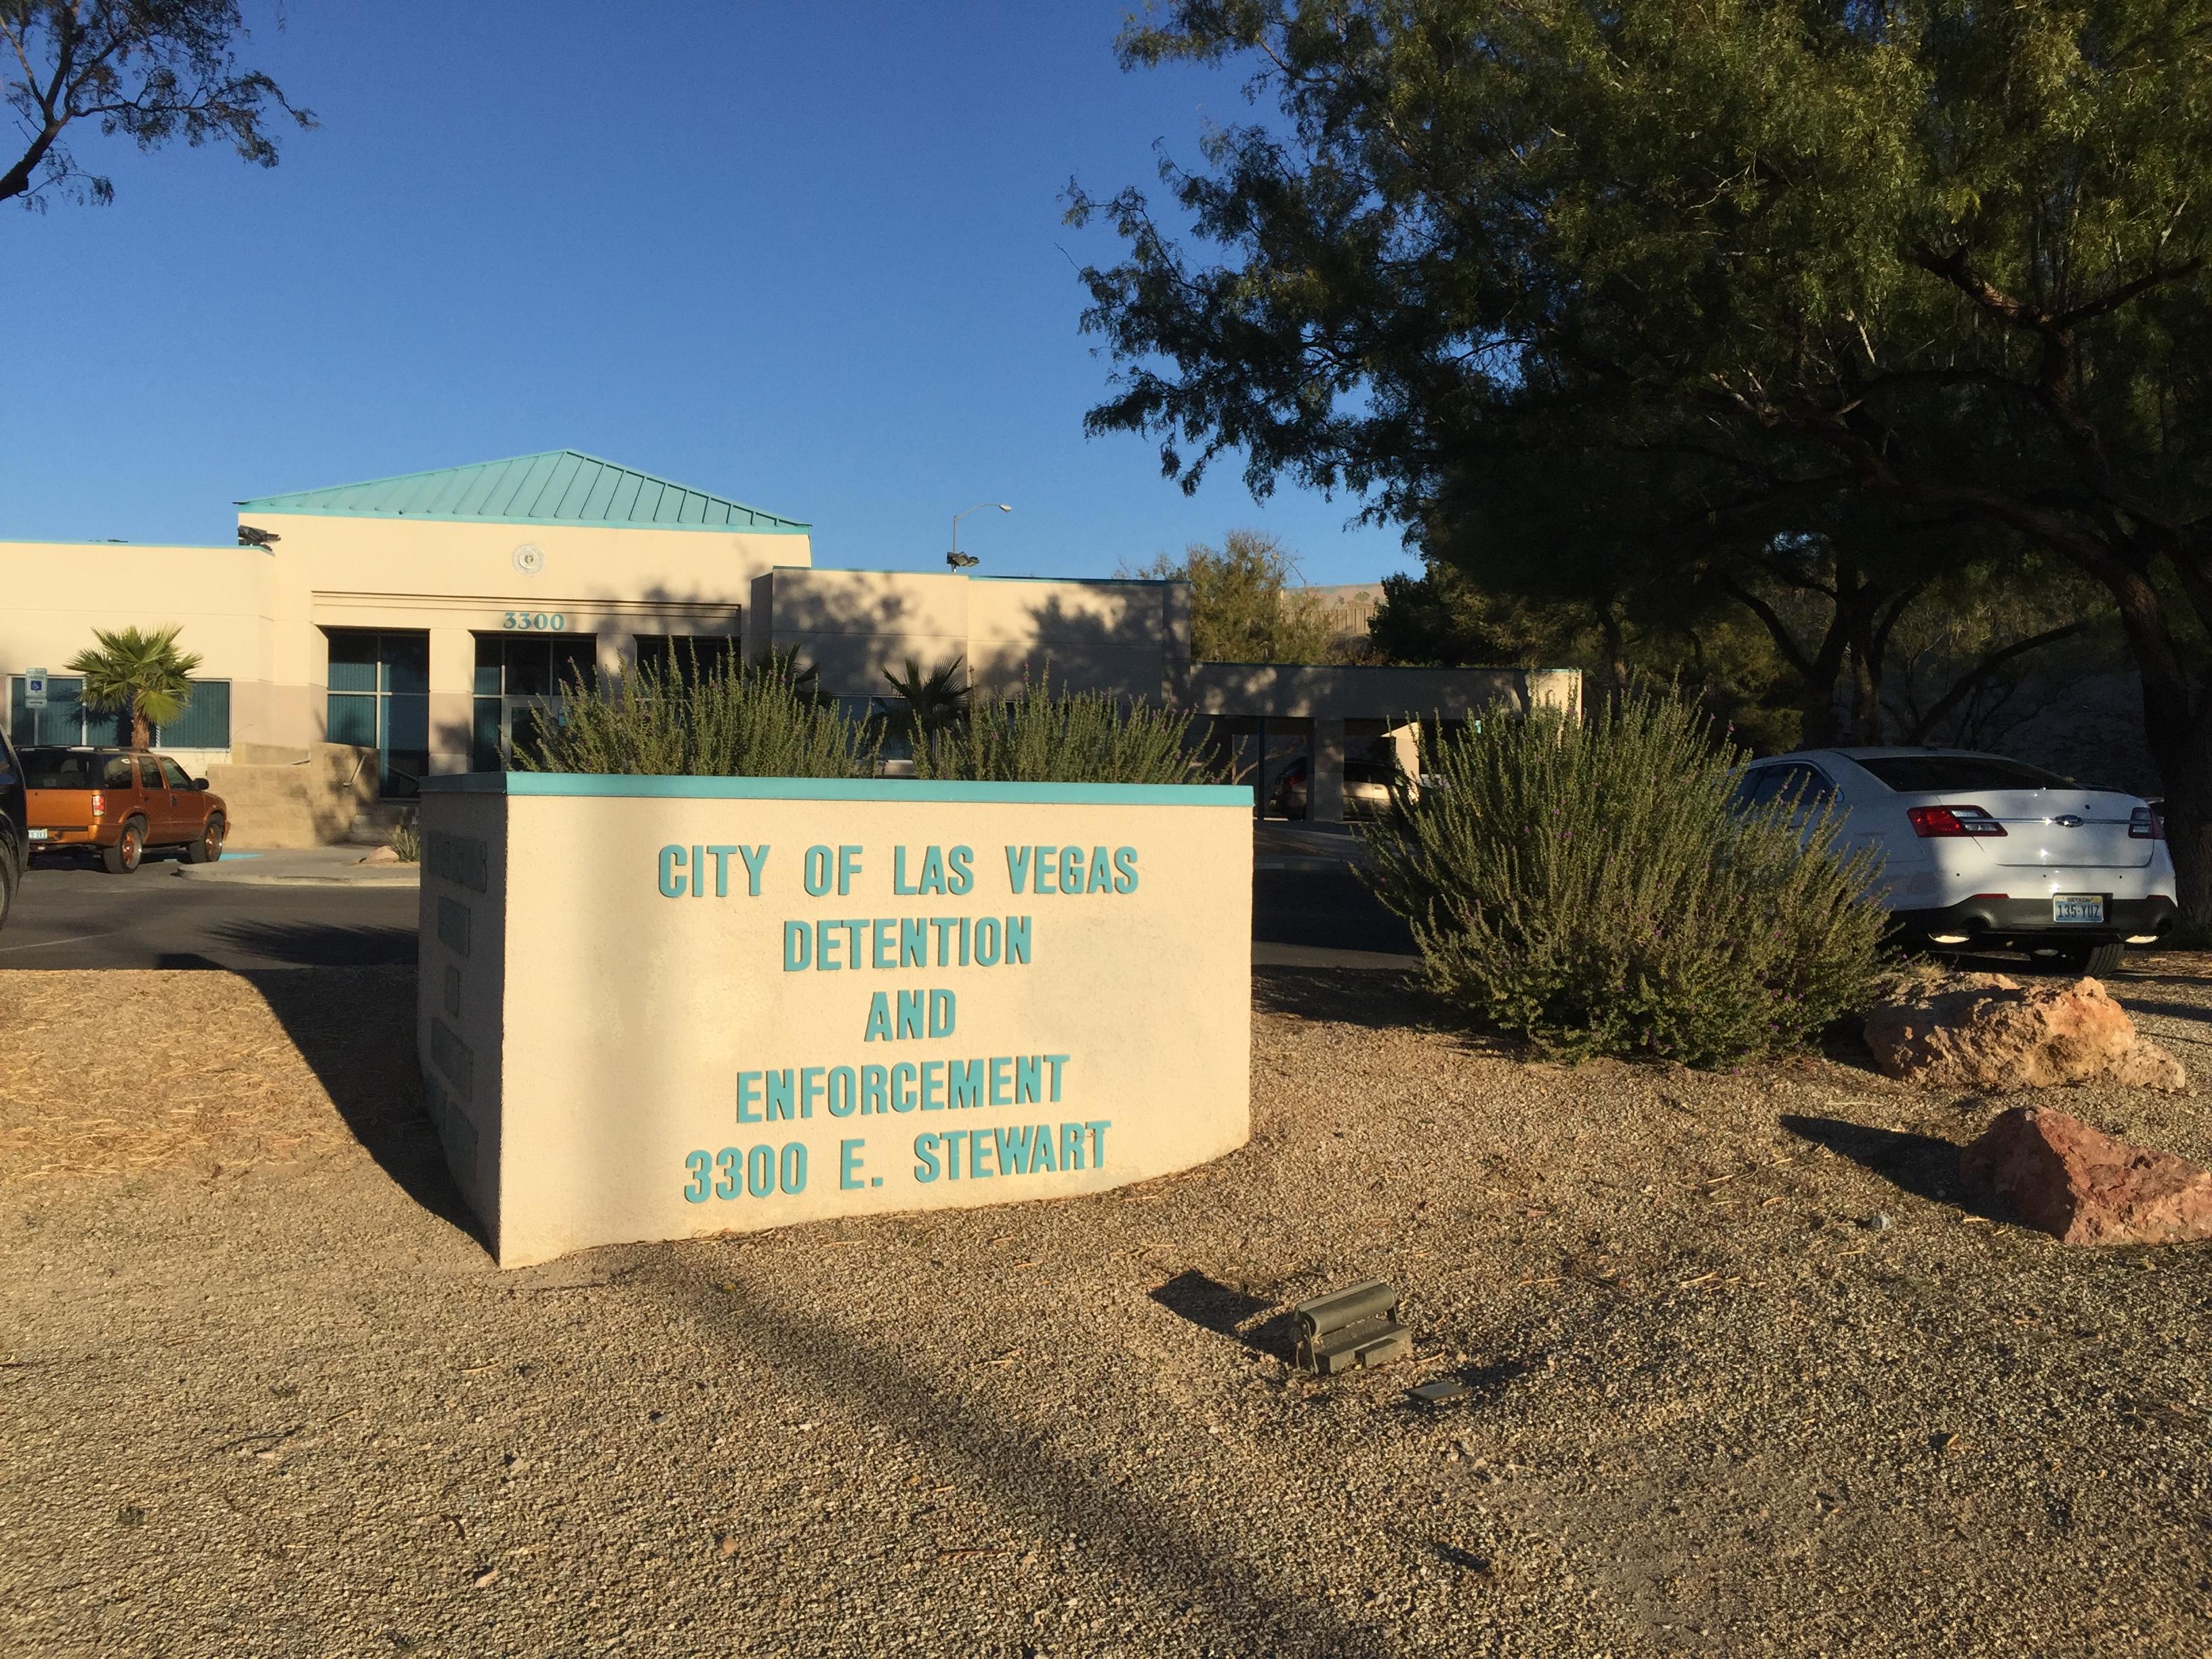 Las Vegas Detention Center Location